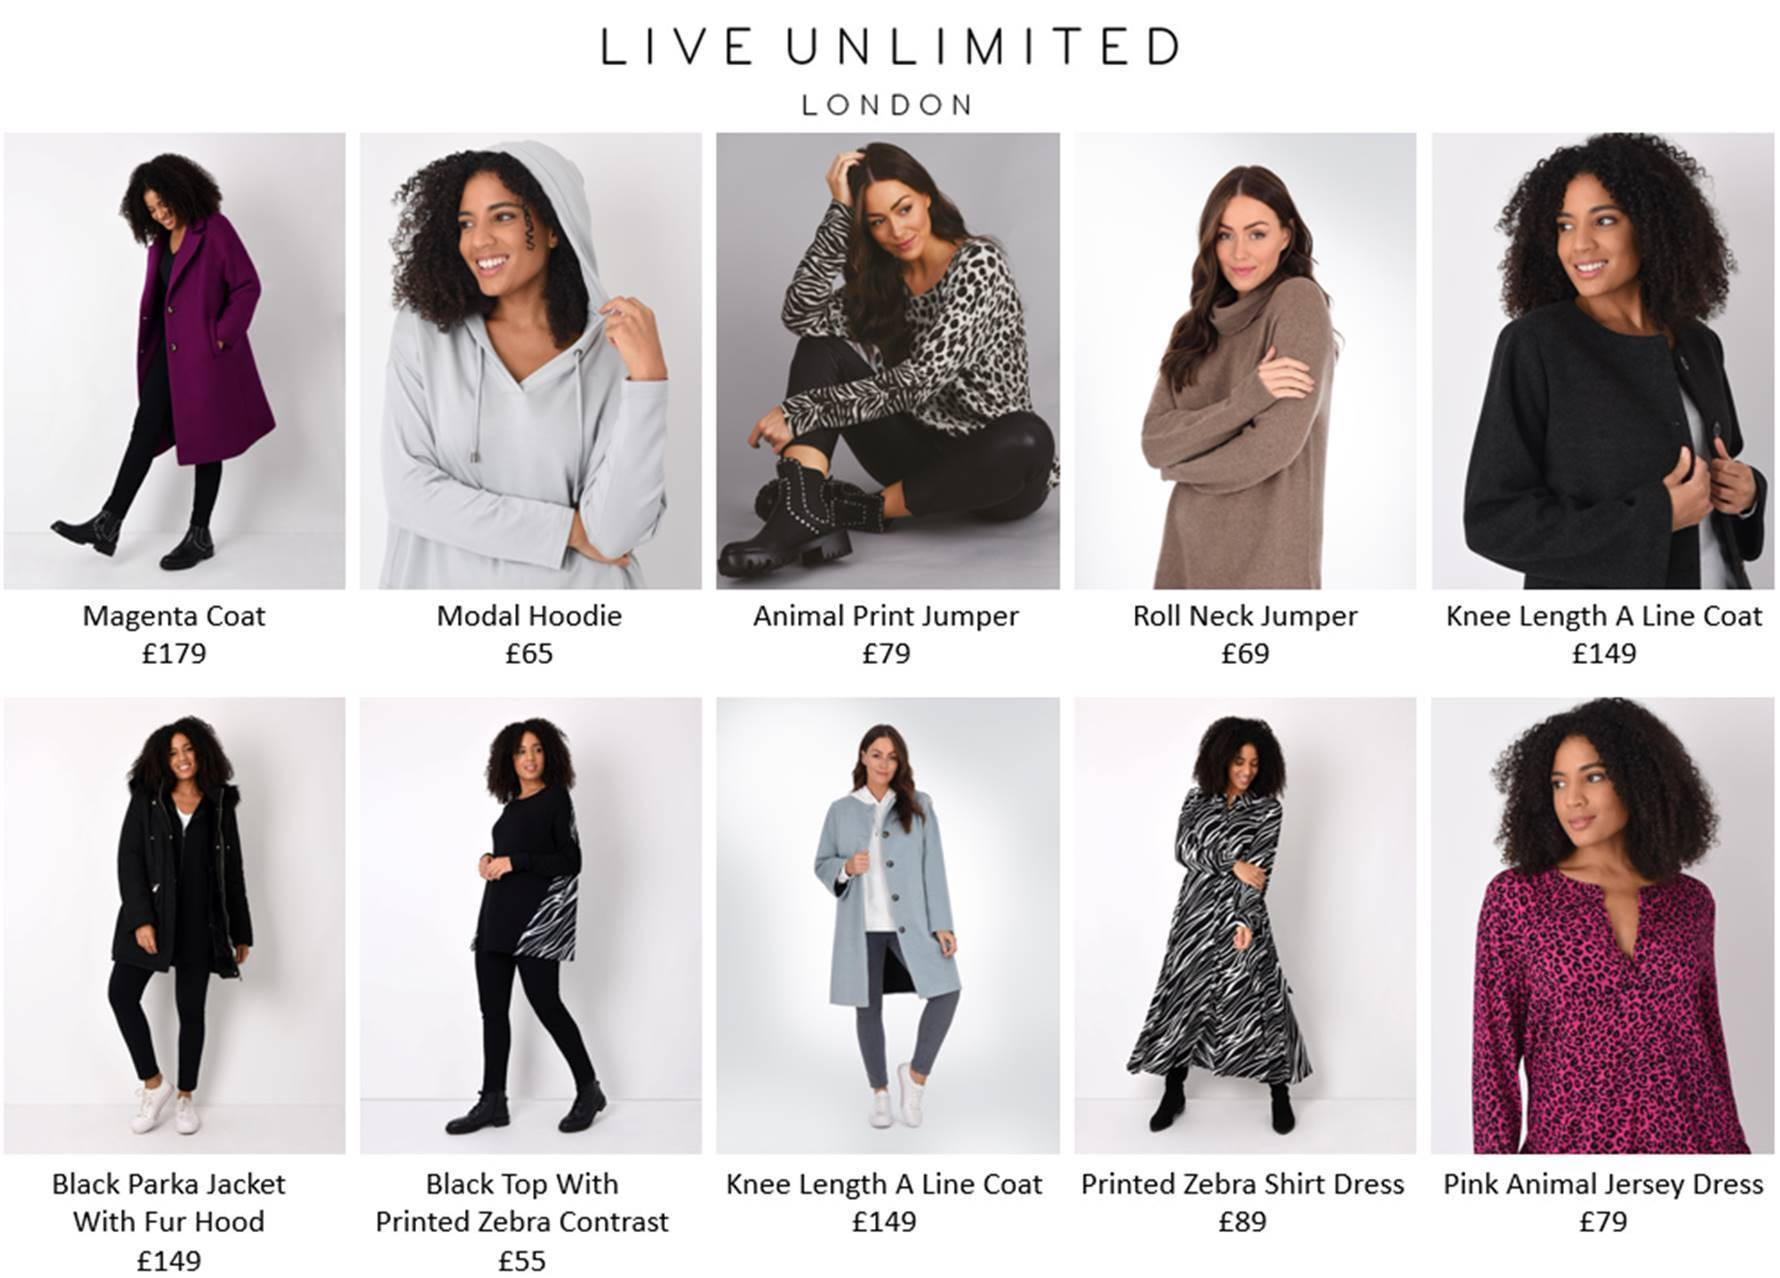 Live Unlimited London - Premium Clothing That Celebrates Women's Curves